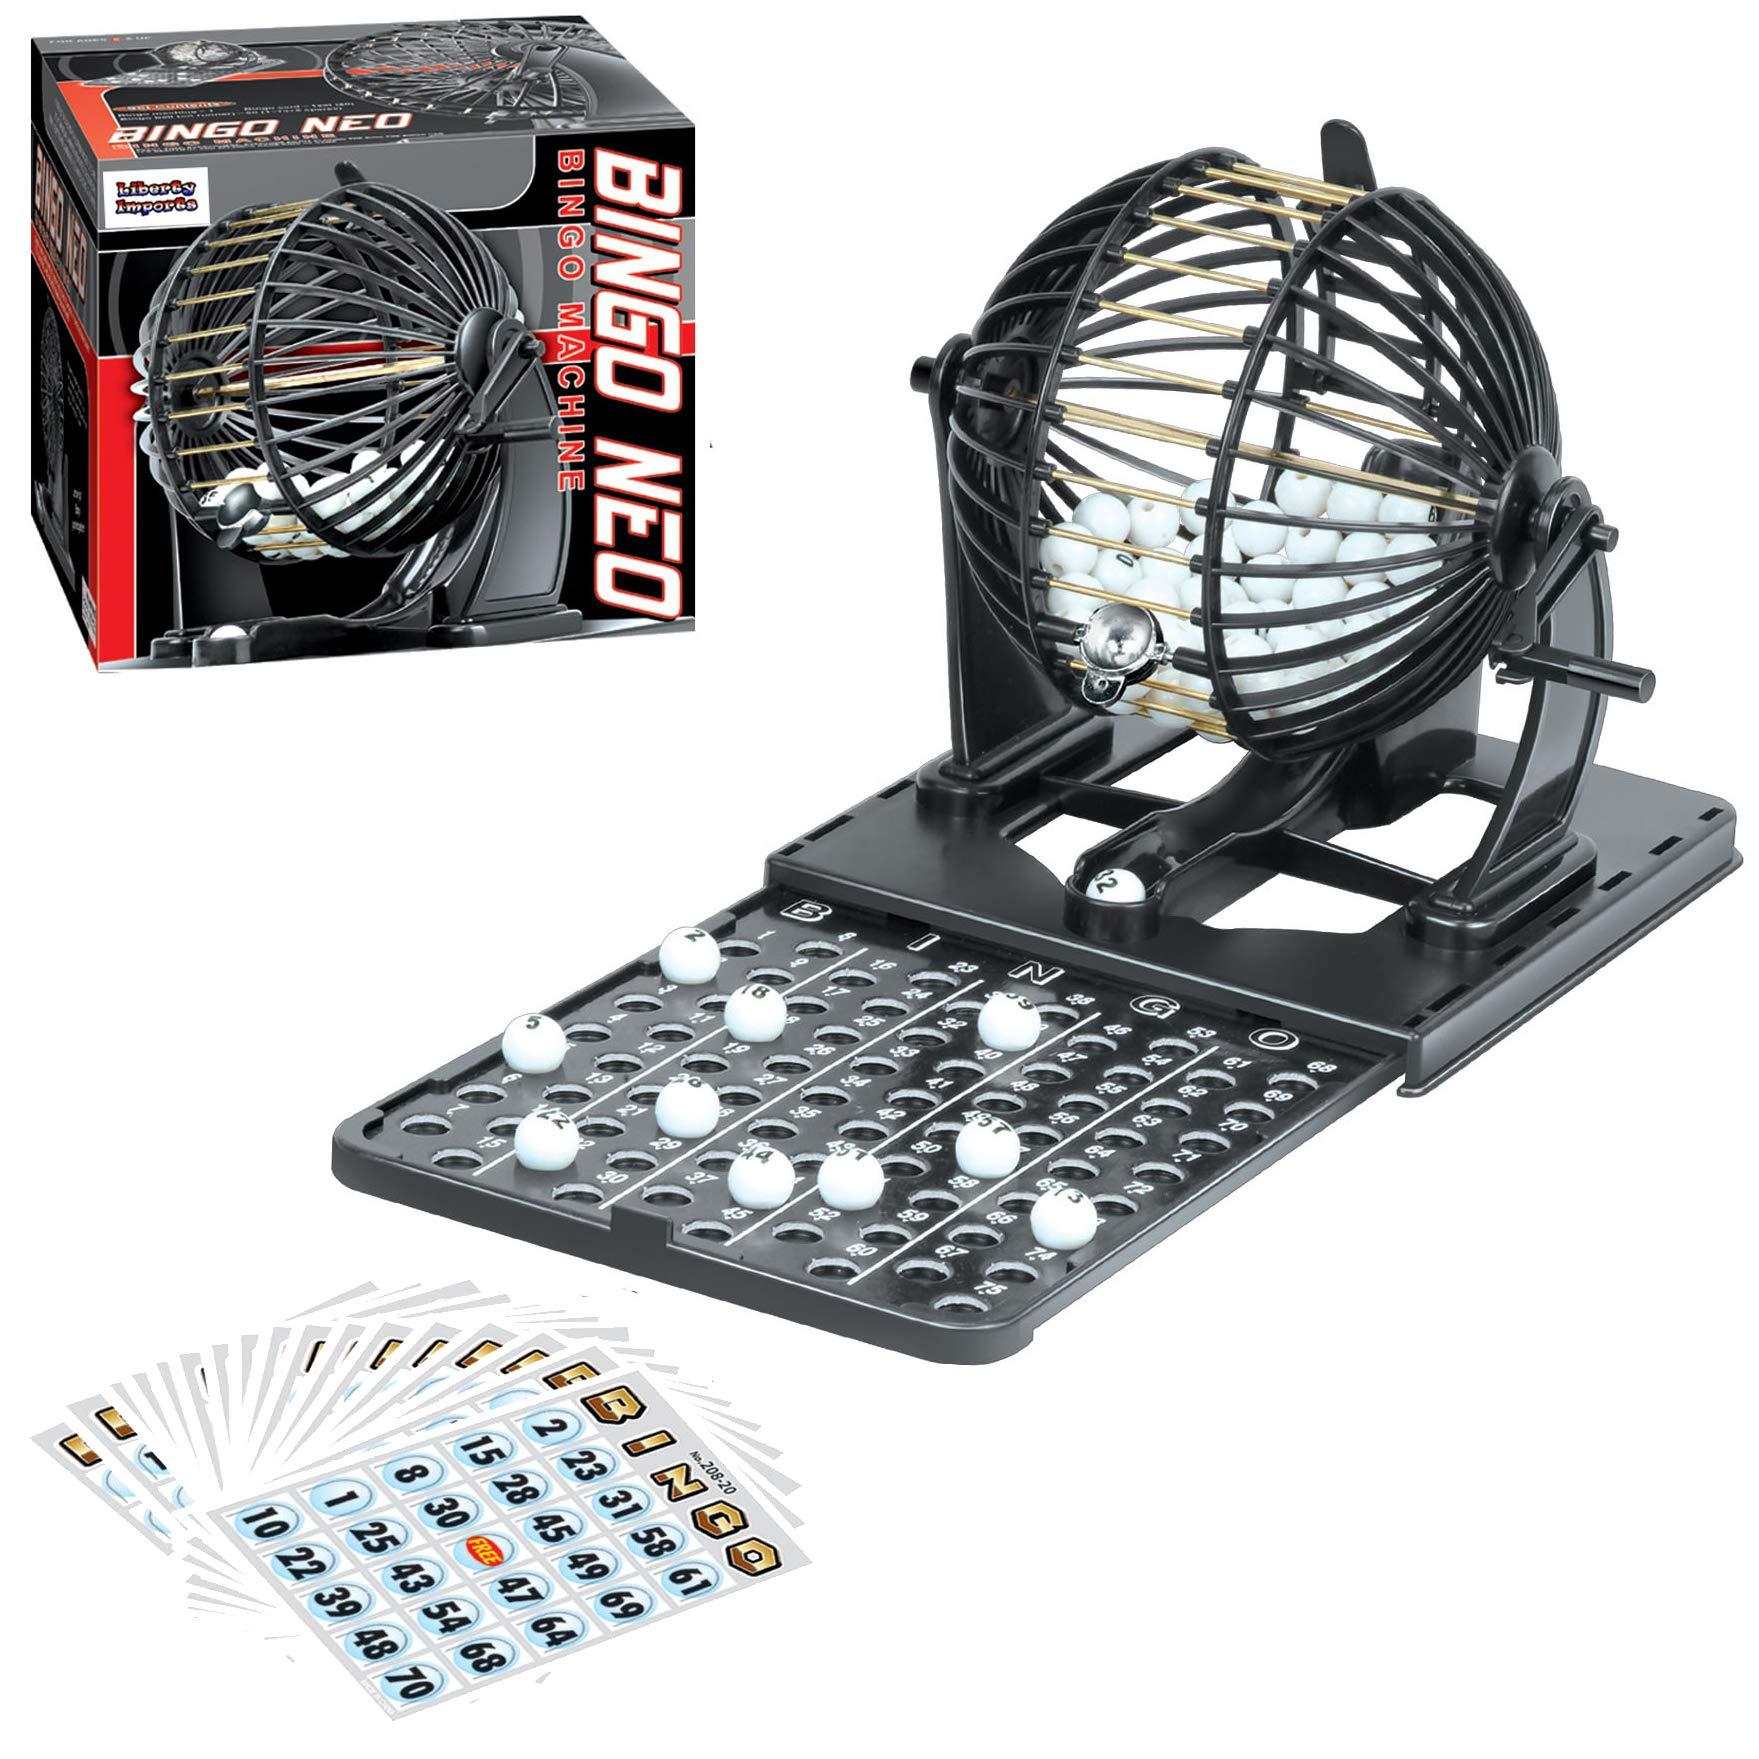 "Pack of 81 Royal Bingo Supplies Pocket 3.5/"" x 2.5/"" Bingo Calling Cards"